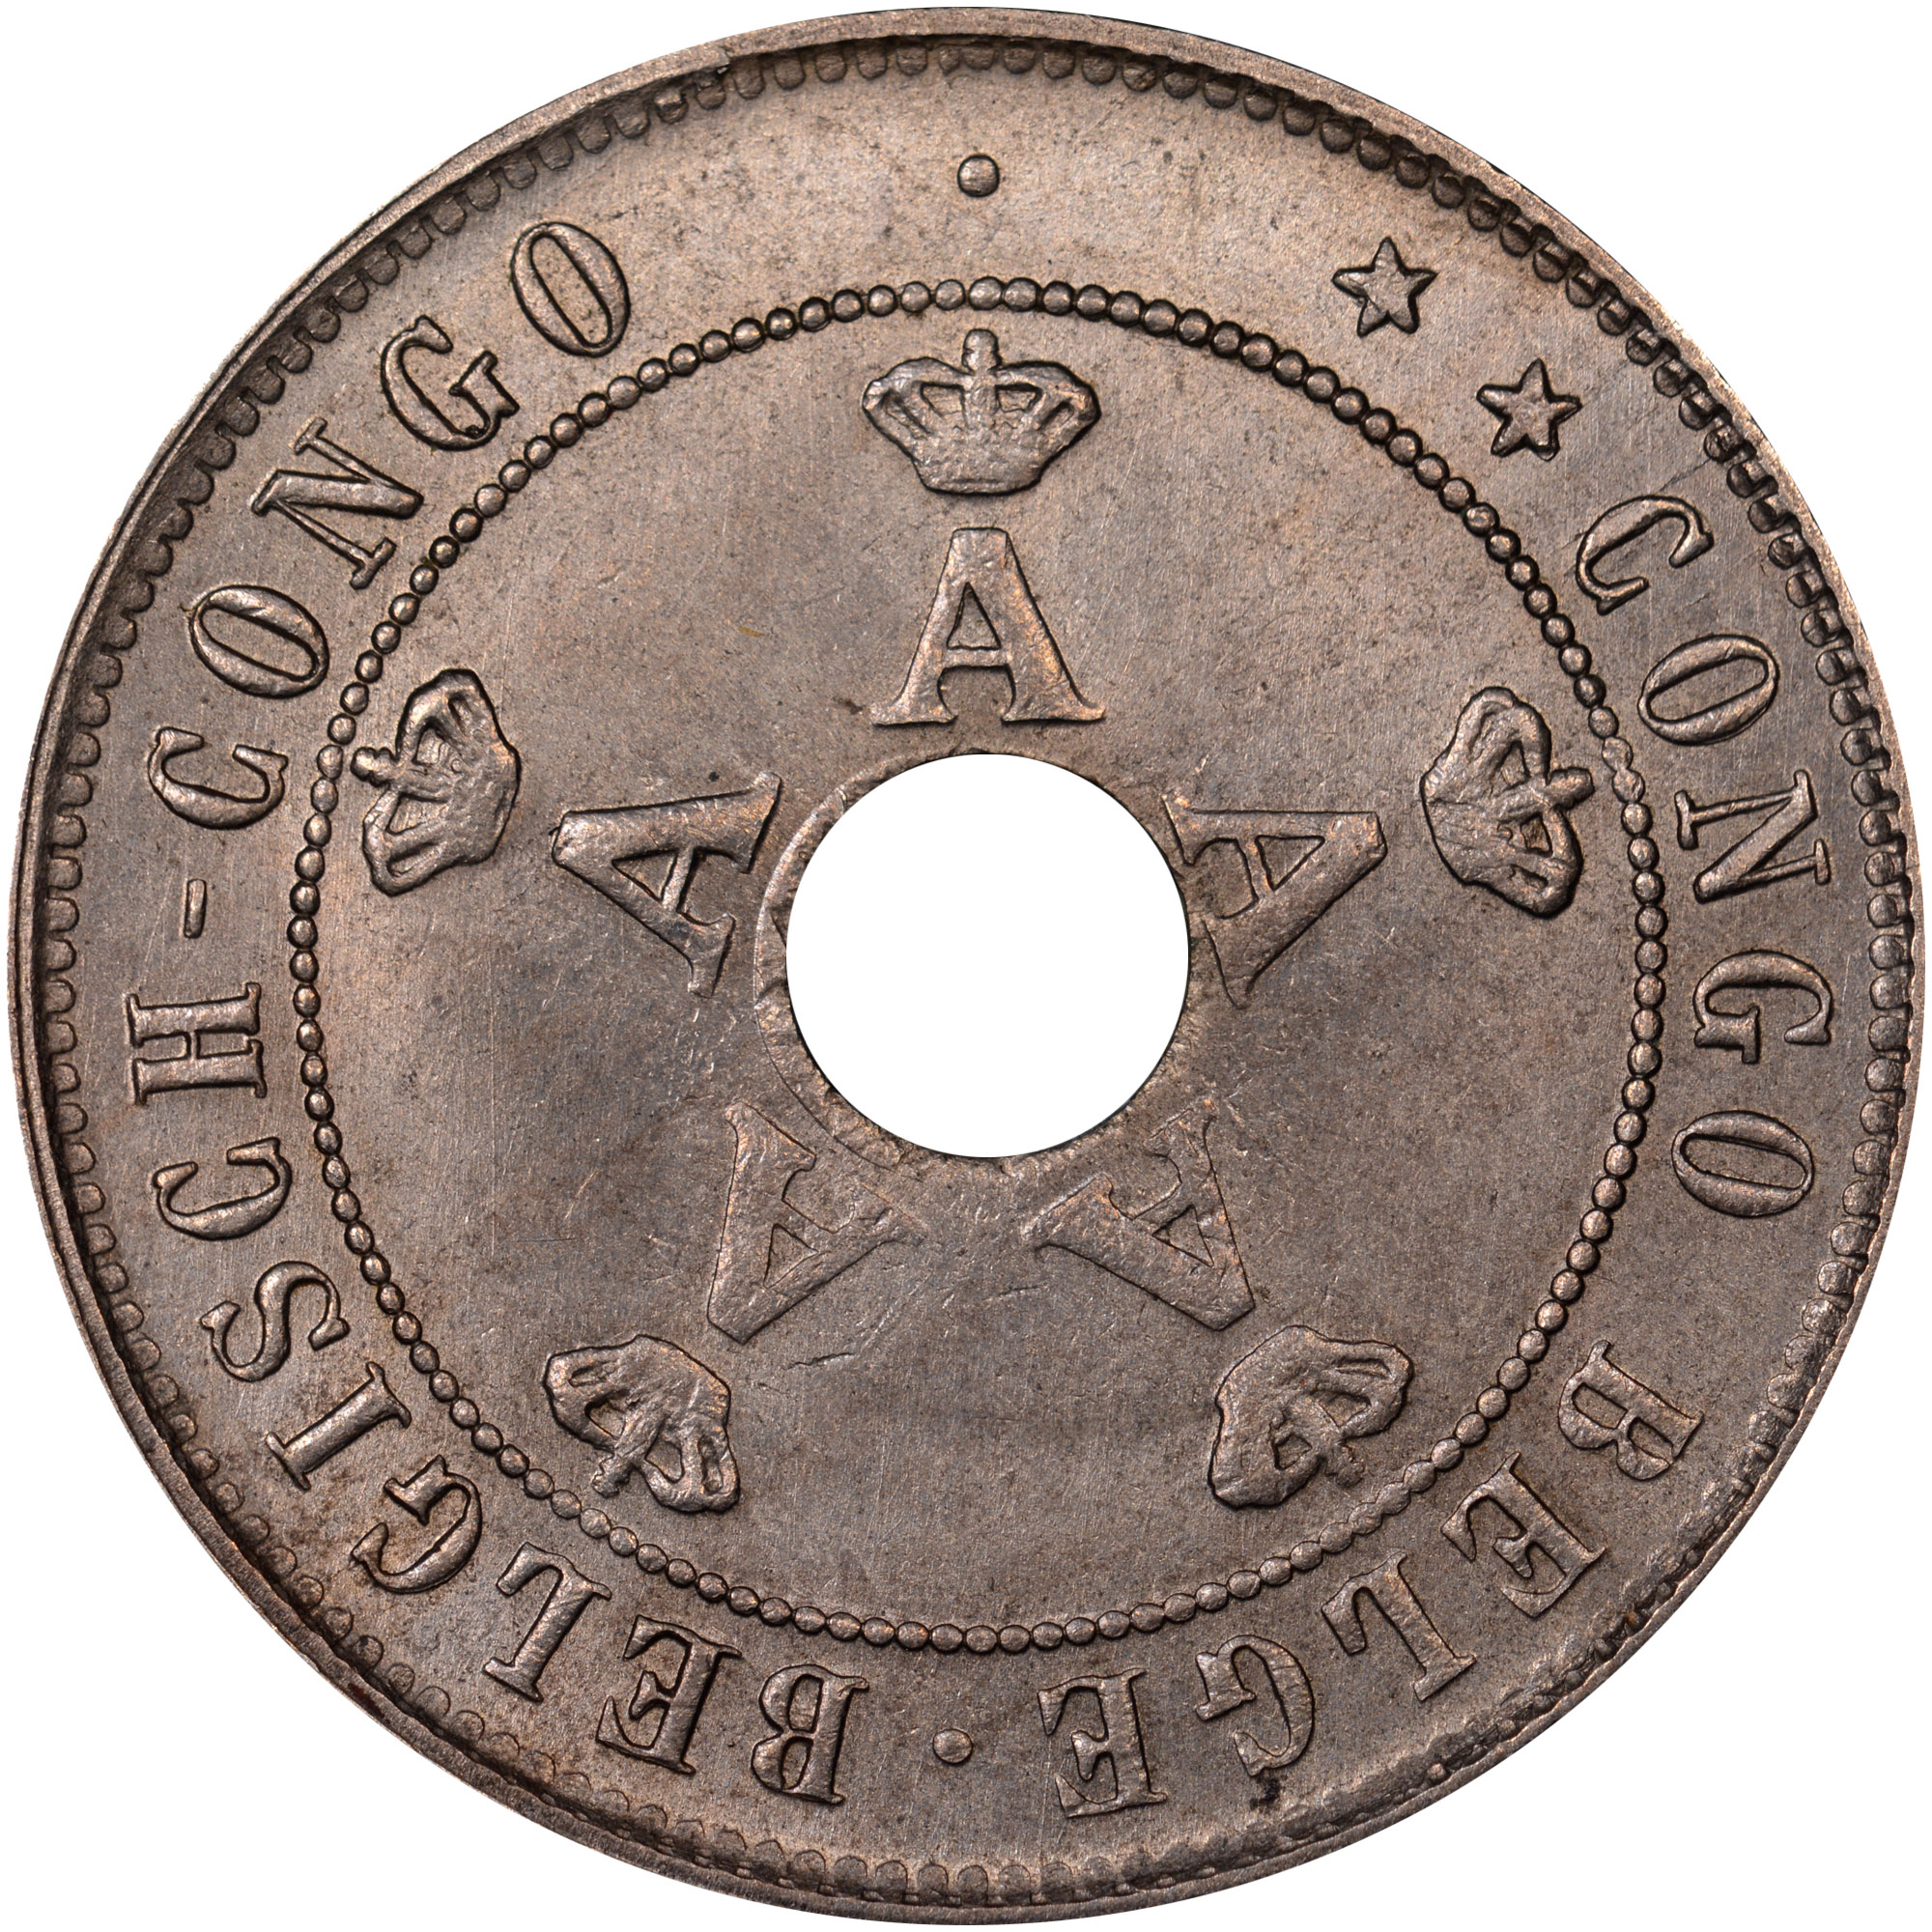 1910-1911 Belgian Congo 20 Centimes obverse